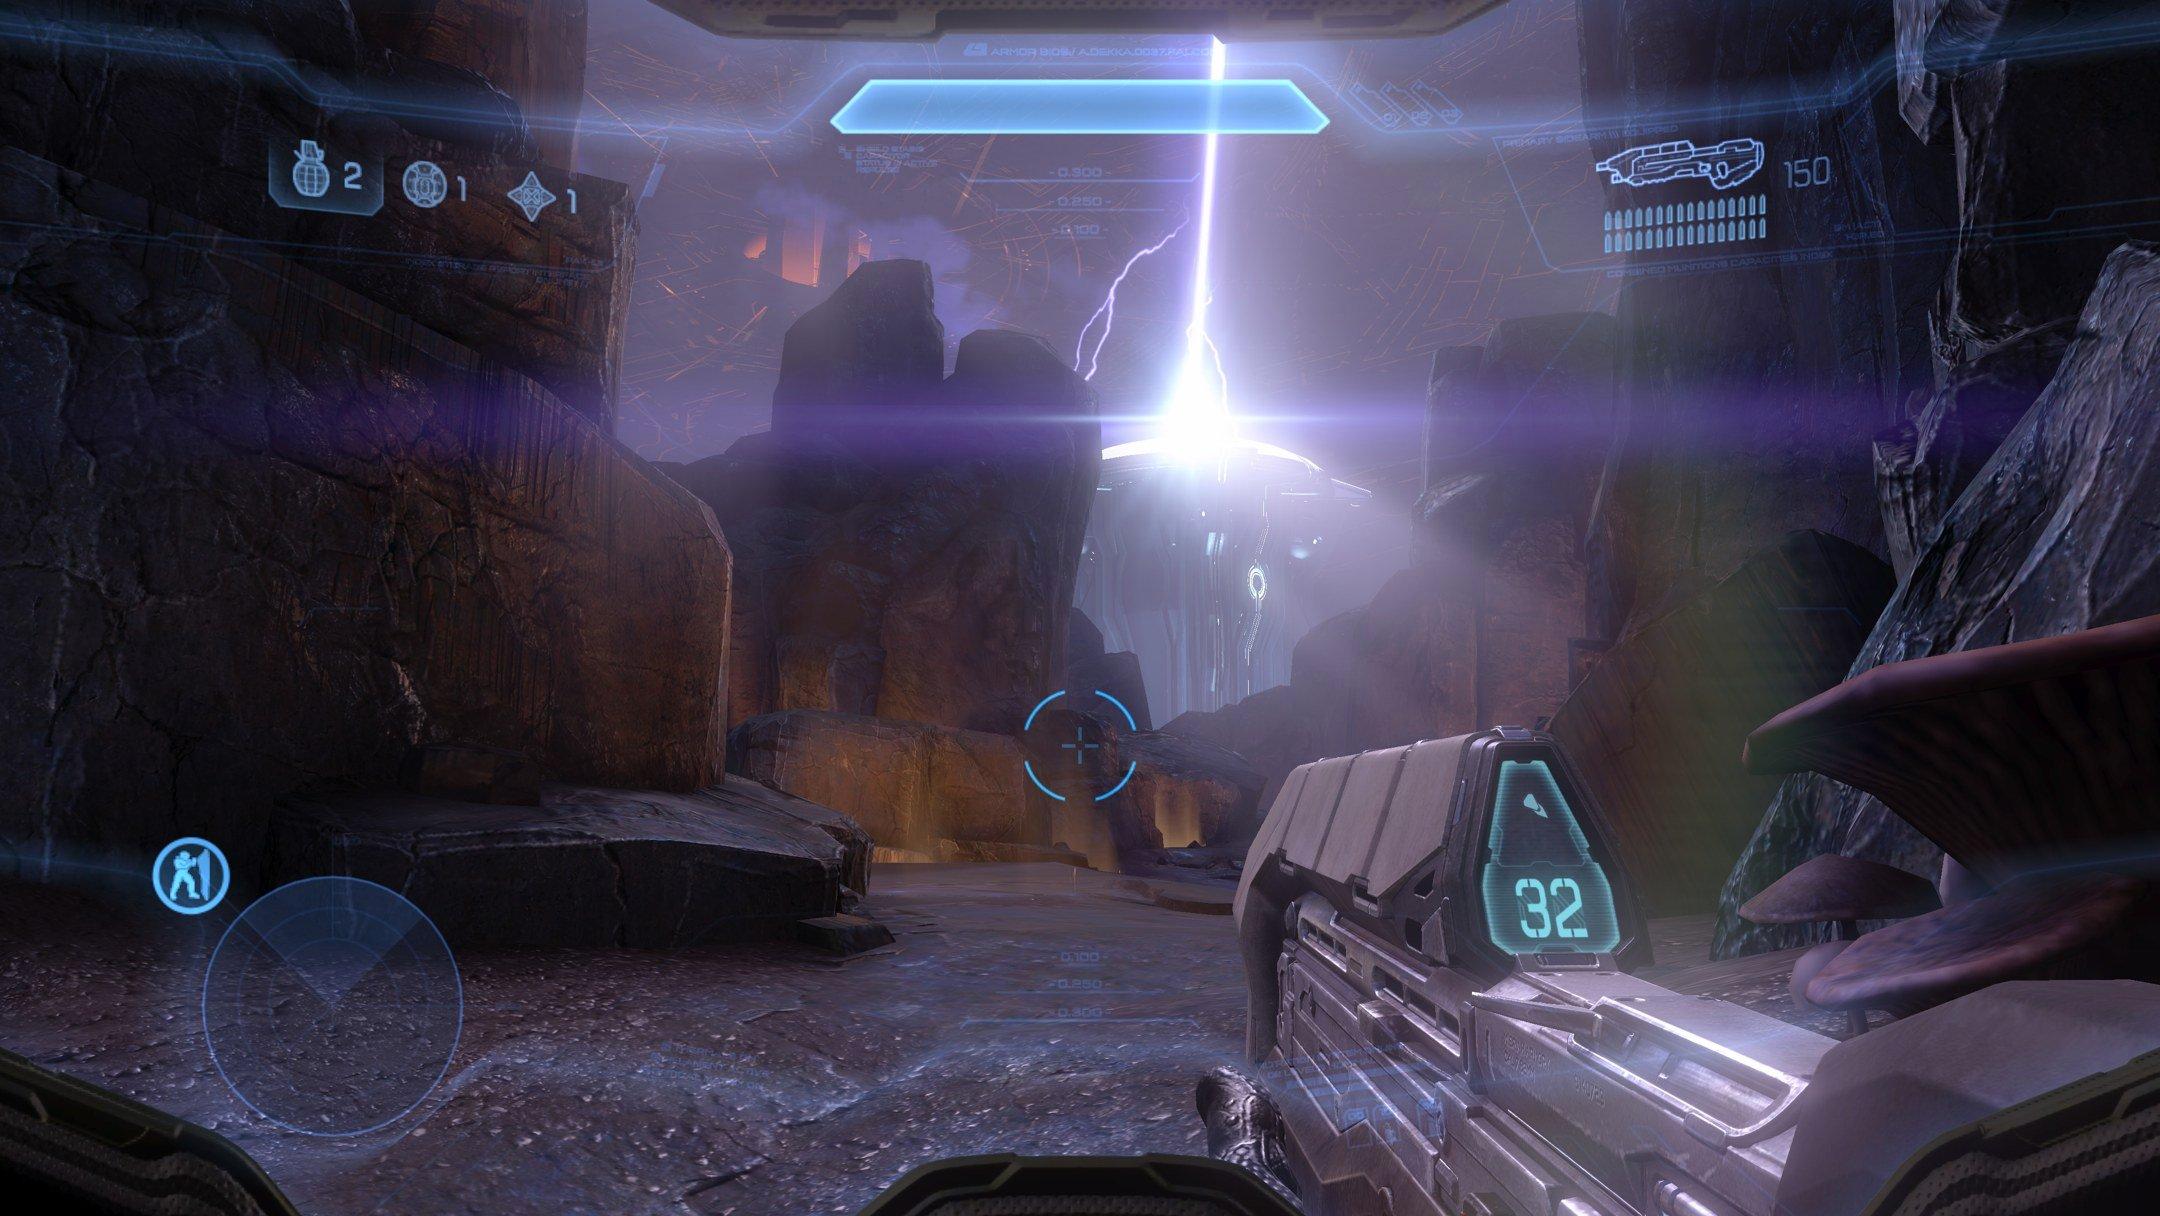 Halo4 360 Editeur 176